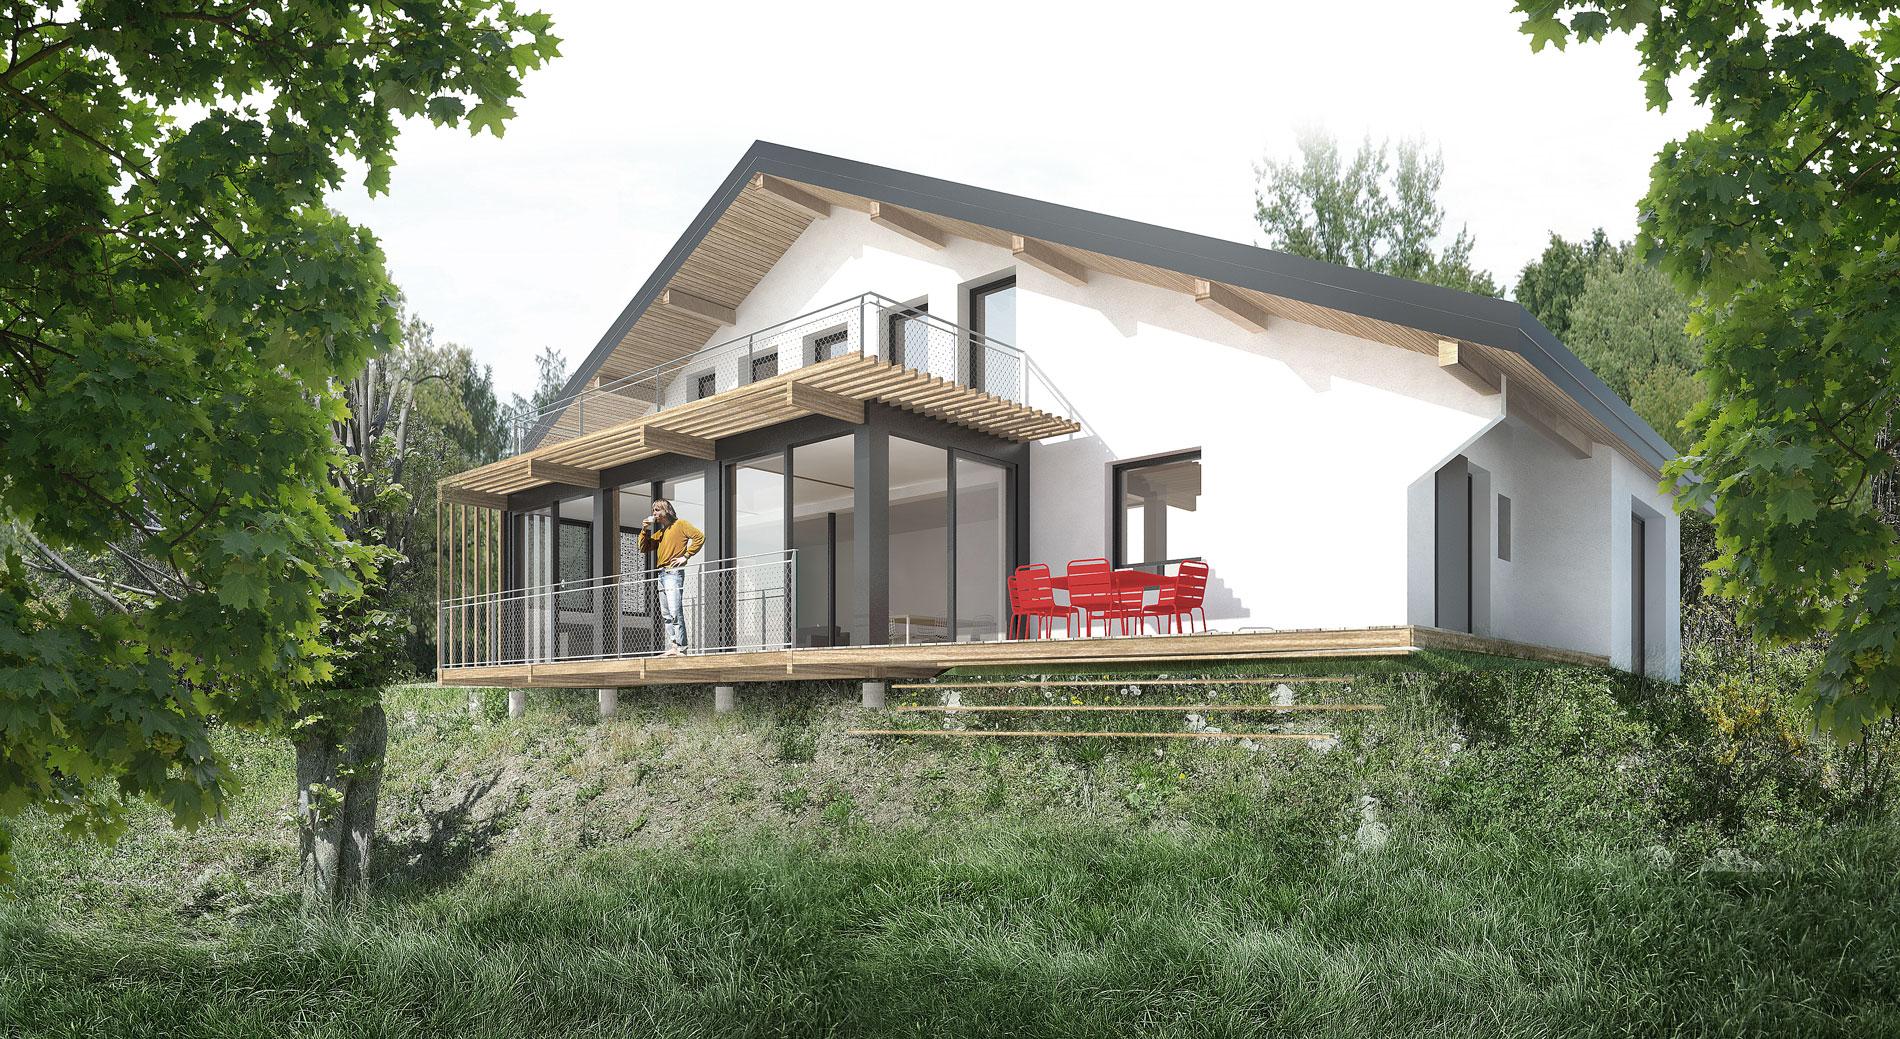 asb-architecture-extension-maison-chambery-les-monts-13-vue-exte